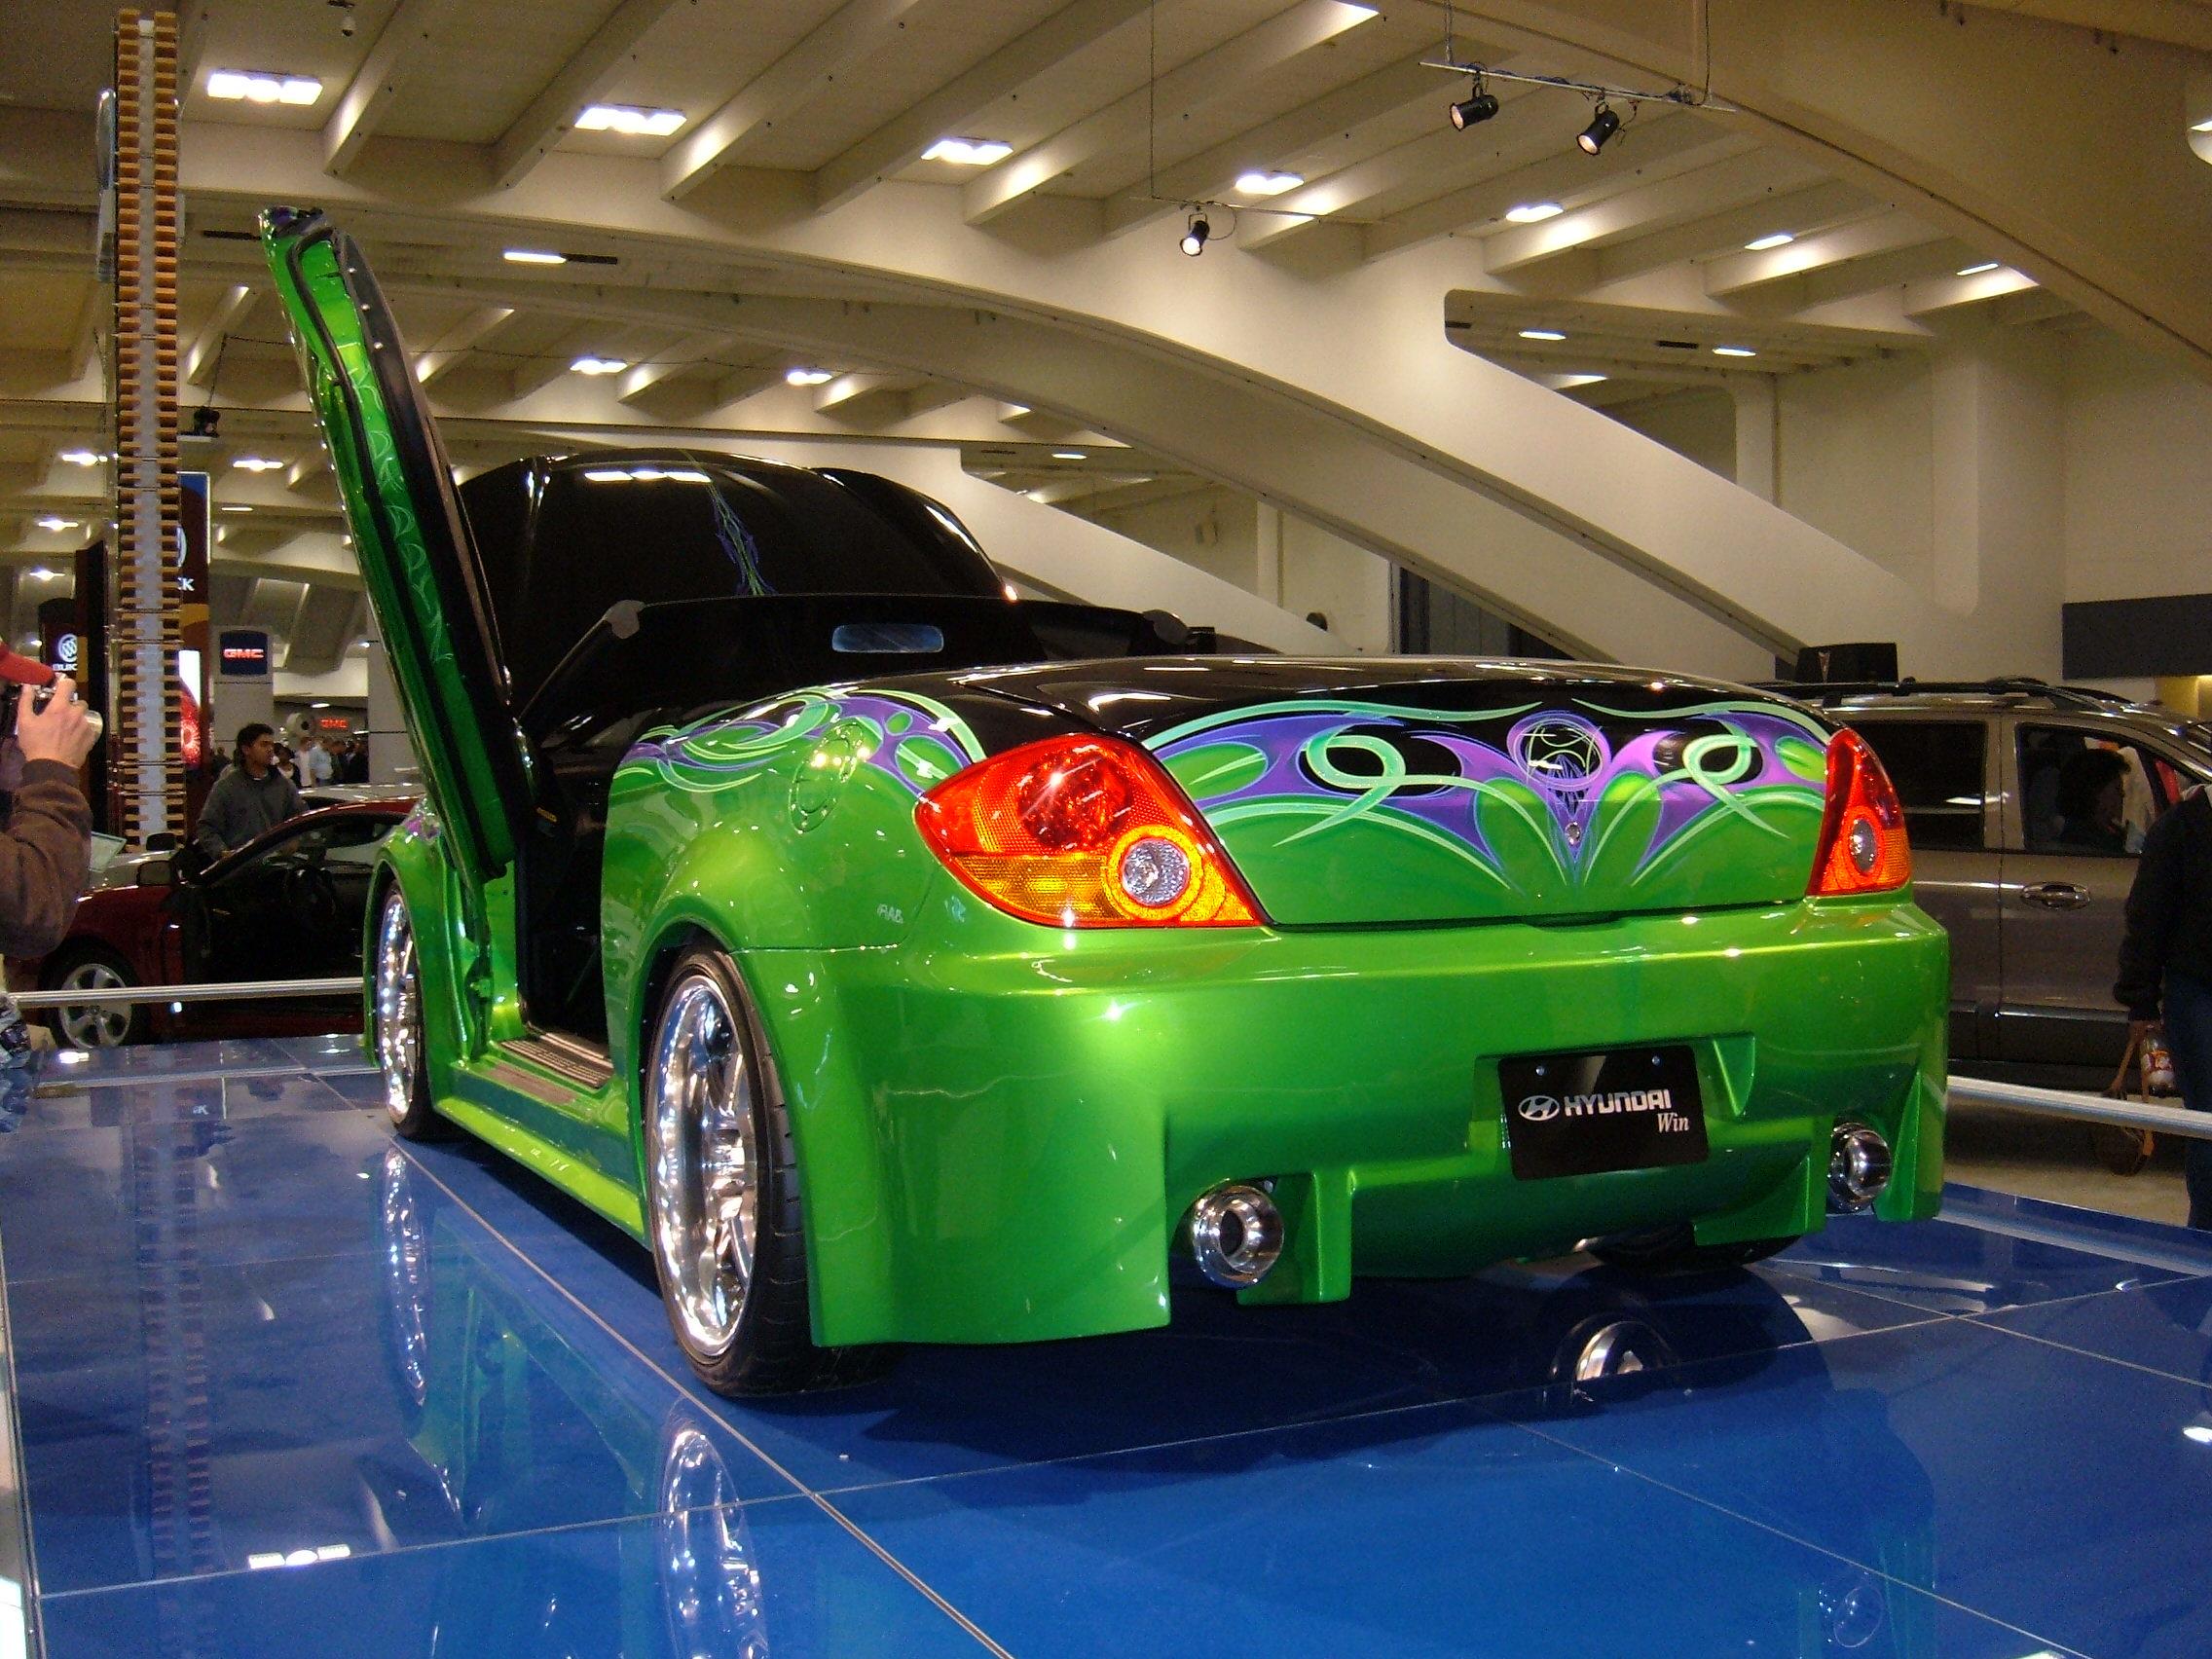 file 2005 customized green hyundai tiburon rear jpg wikimedia commons https commons wikimedia org wiki file 2005 customized green hyundai tiburon rear jpg